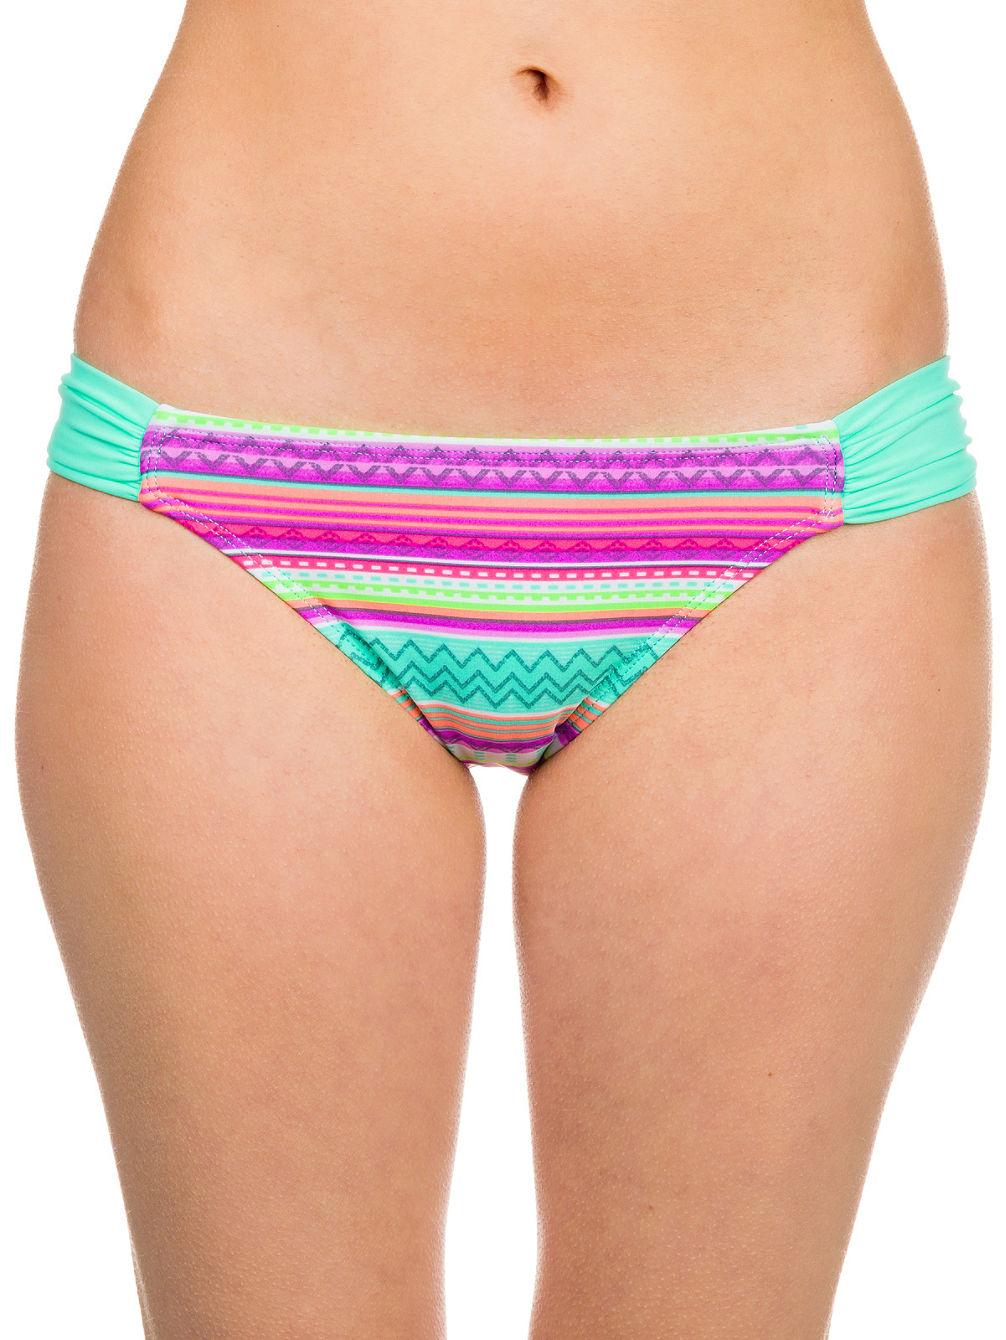 empyre-girls-stripe-trip-hipster-bikini-bottom